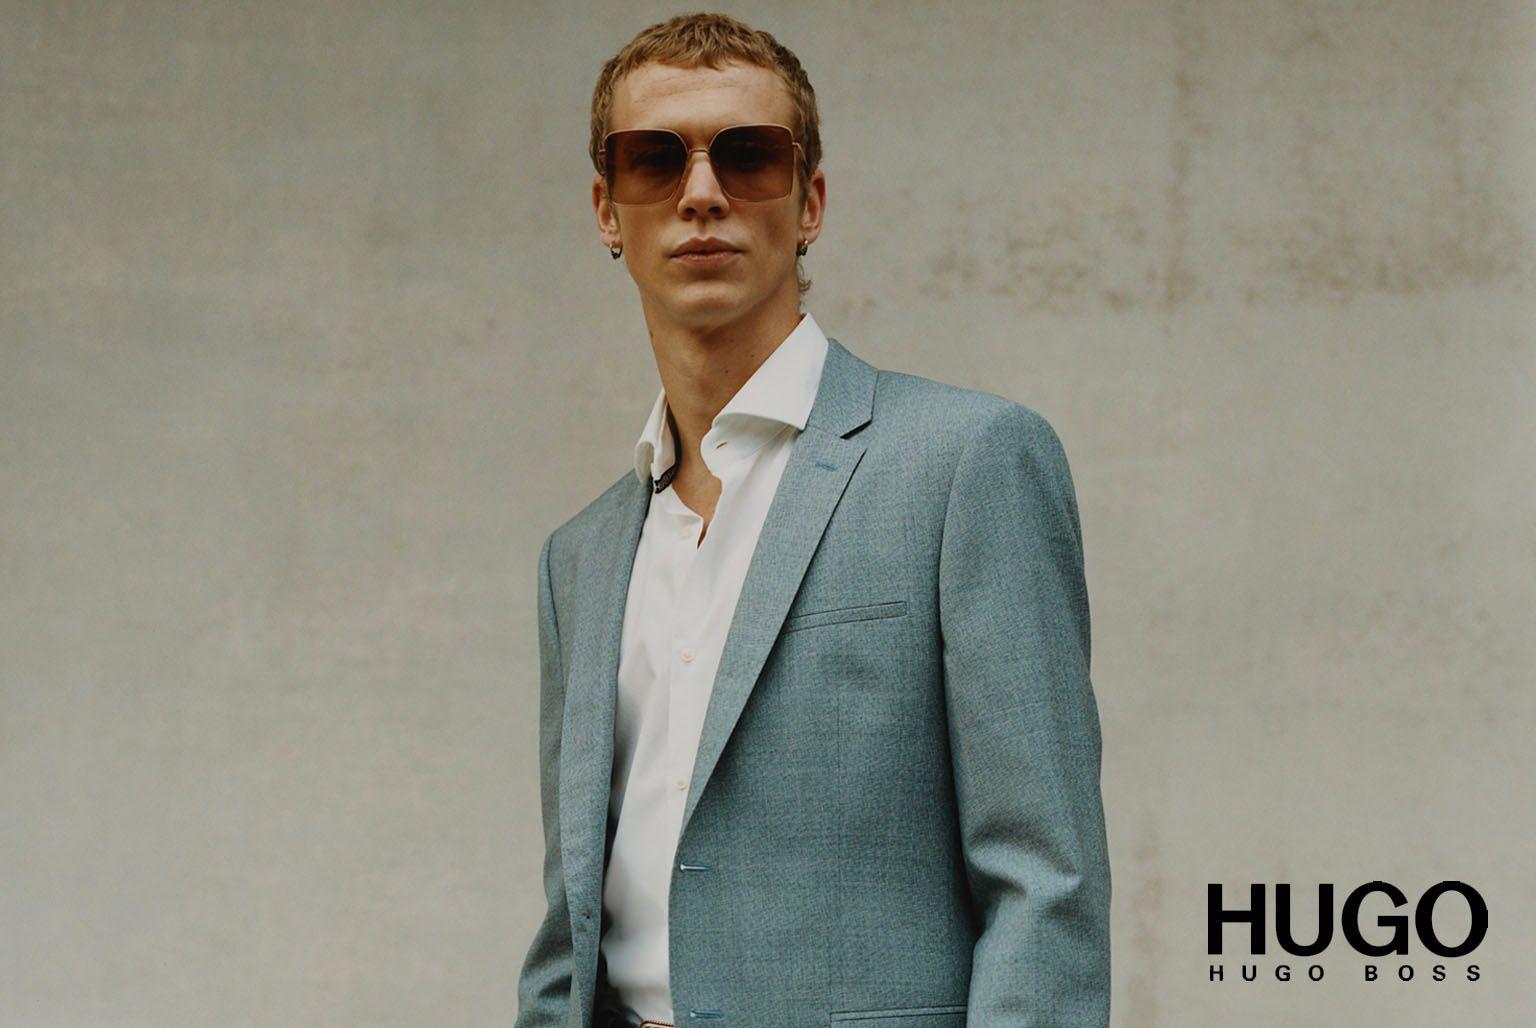 Hugo Boss Men/'s Ther-L Genuine Leather Belt